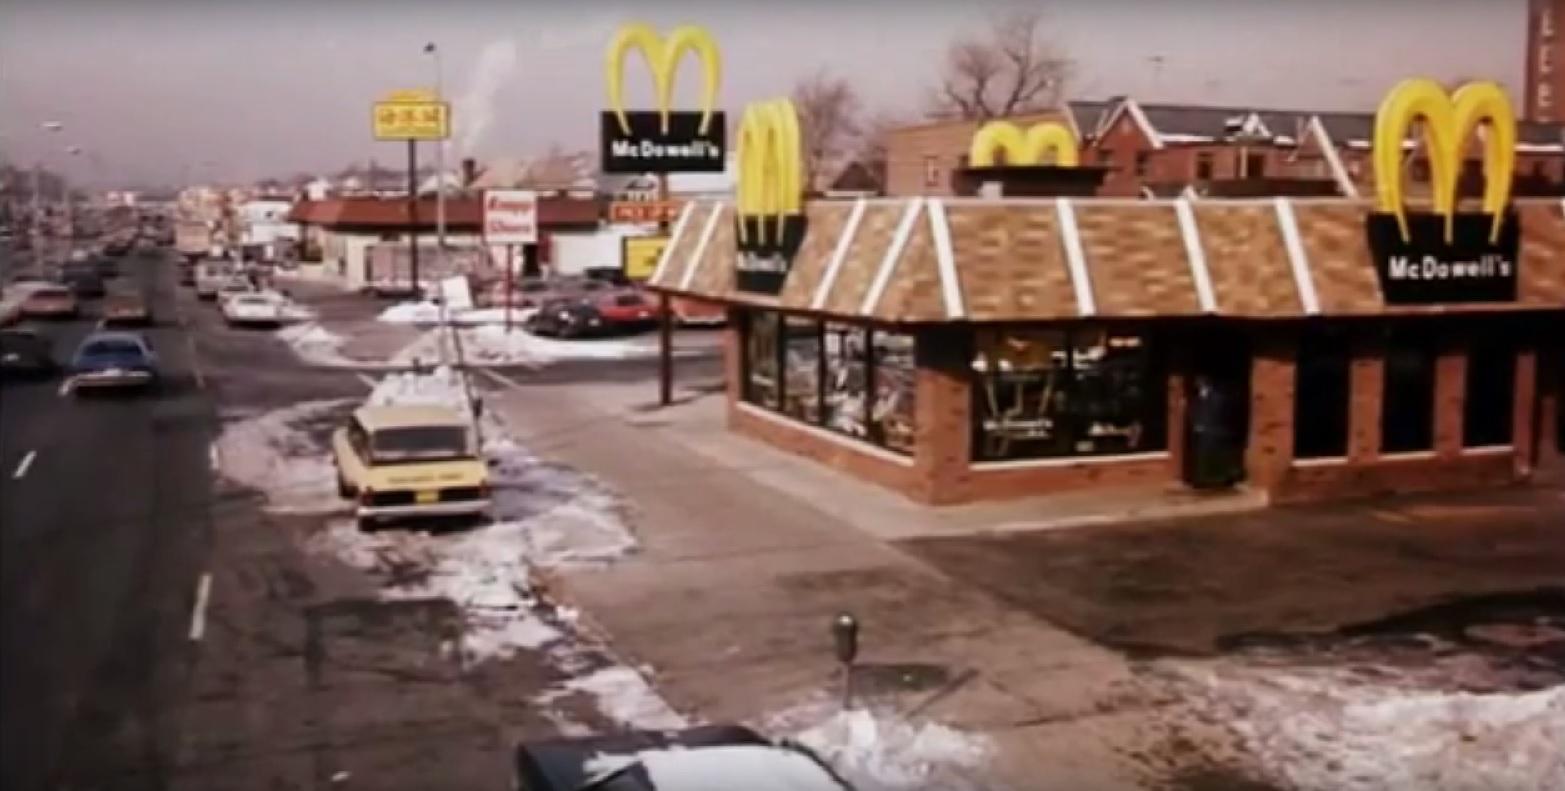 McDowells restaurant Coming to America YouTube screenshot/Daniele Alessandra